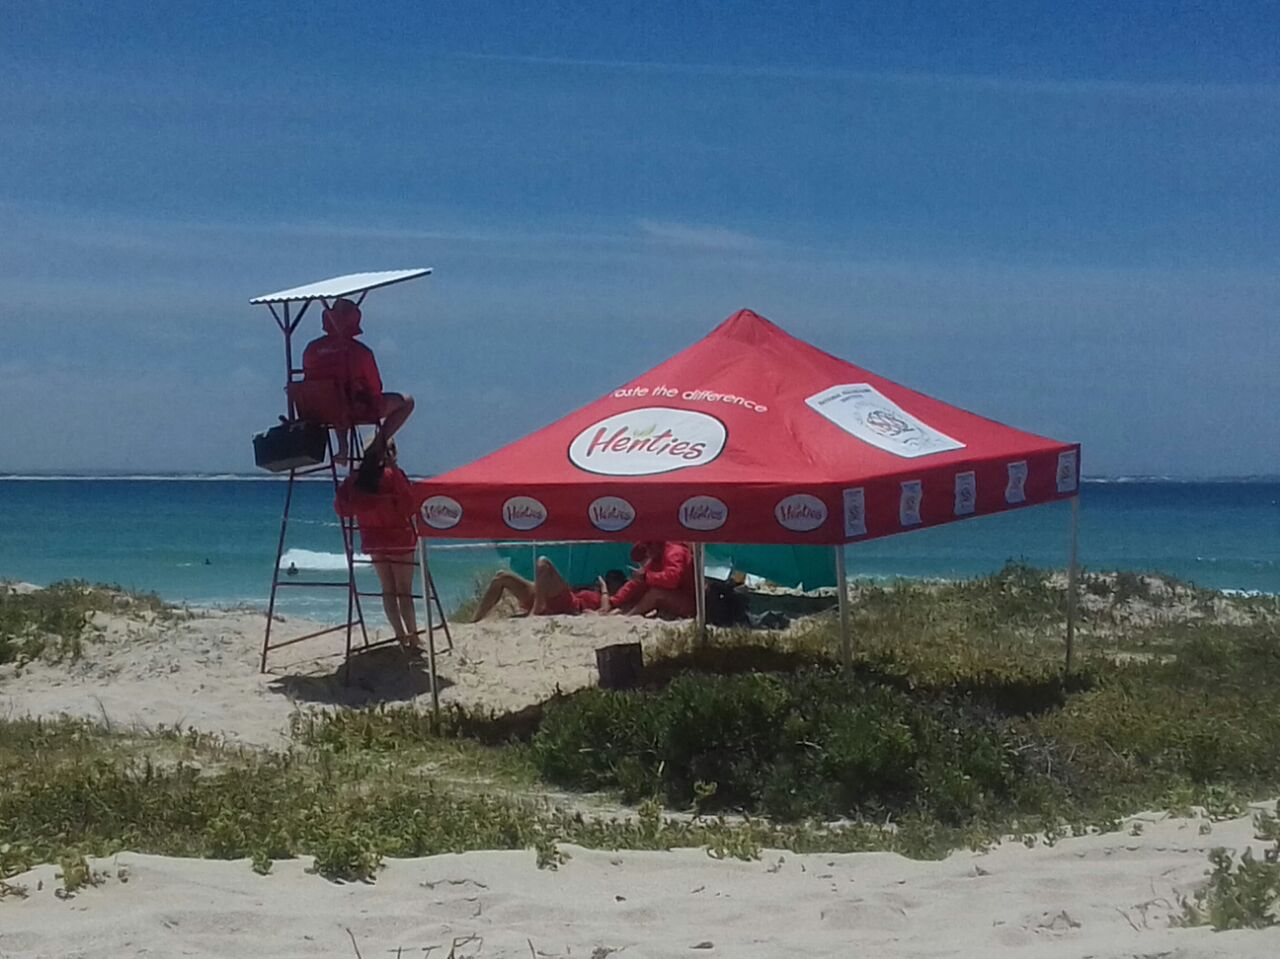 Lifeguard Sponsorship